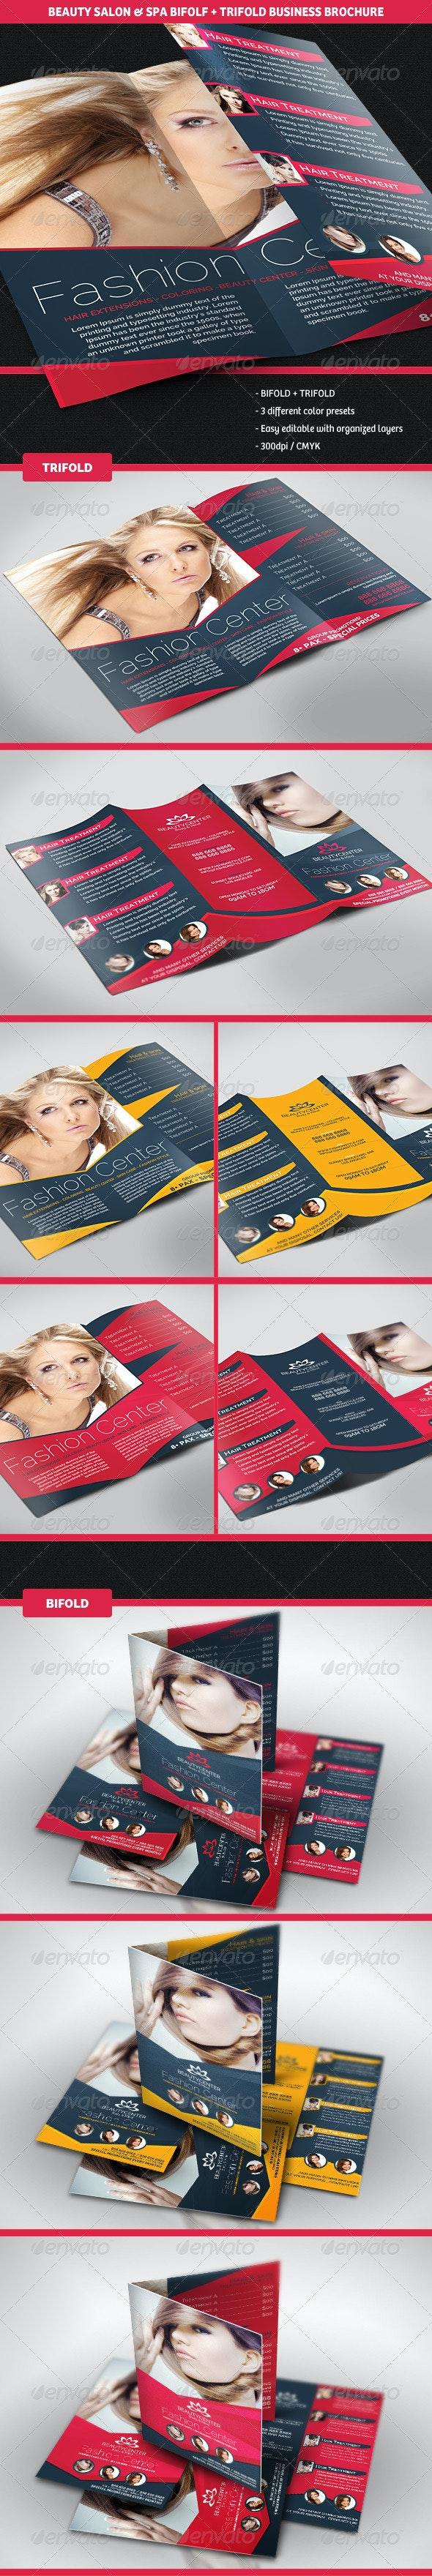 Beauty Center Bifold + Trifold Business Brochures - Corporate Brochures